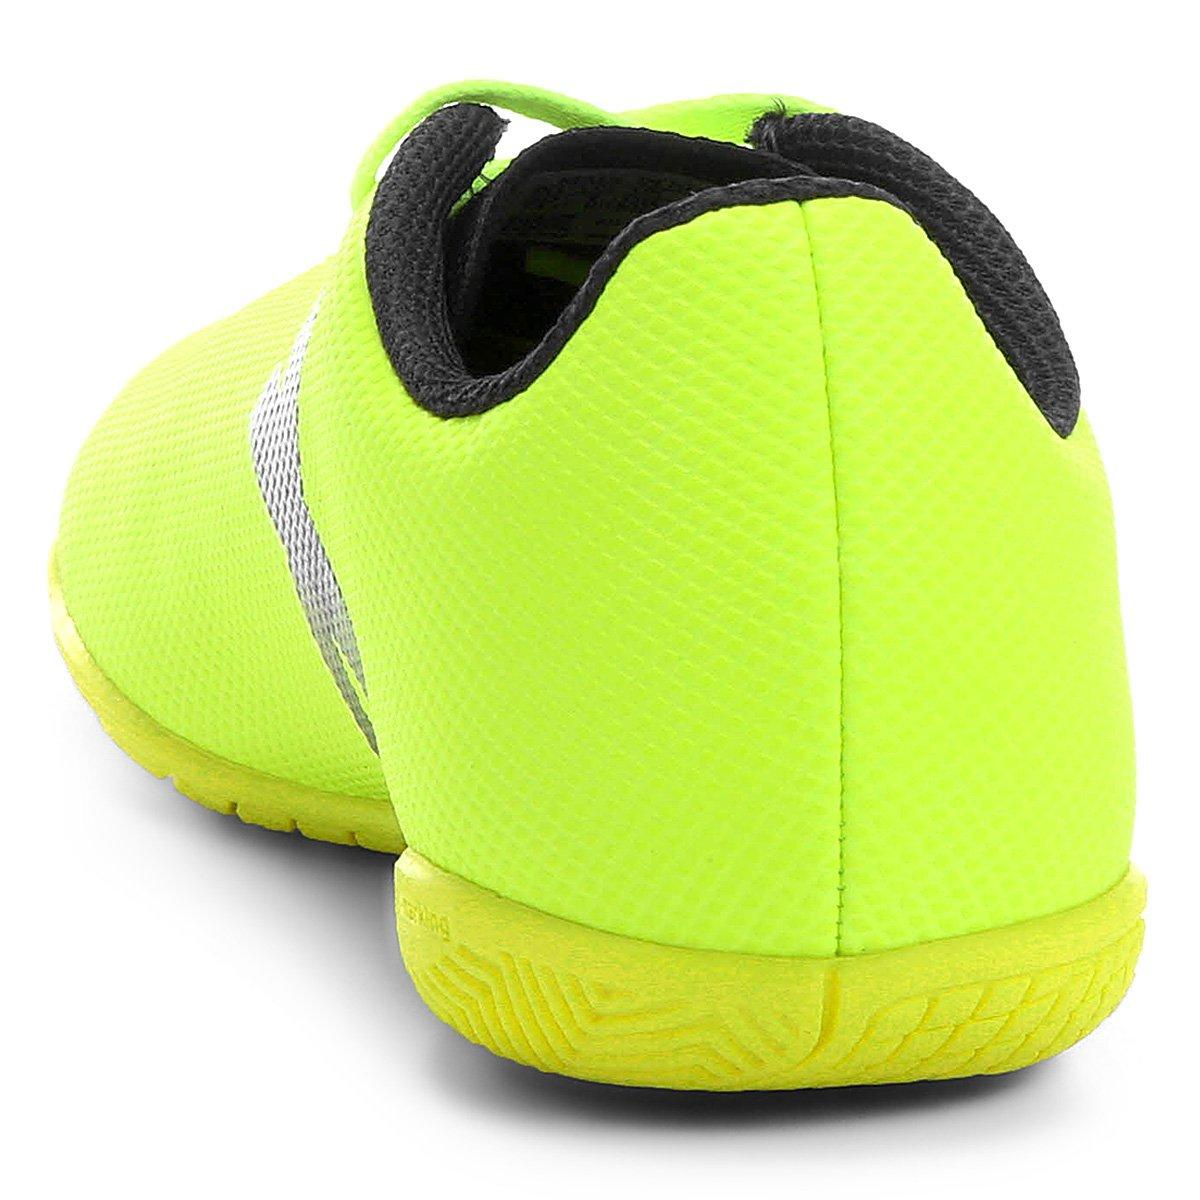 738e87ac7f Chuteira Futsal Infantil Adidas X 17.4 IN - Compre Agora